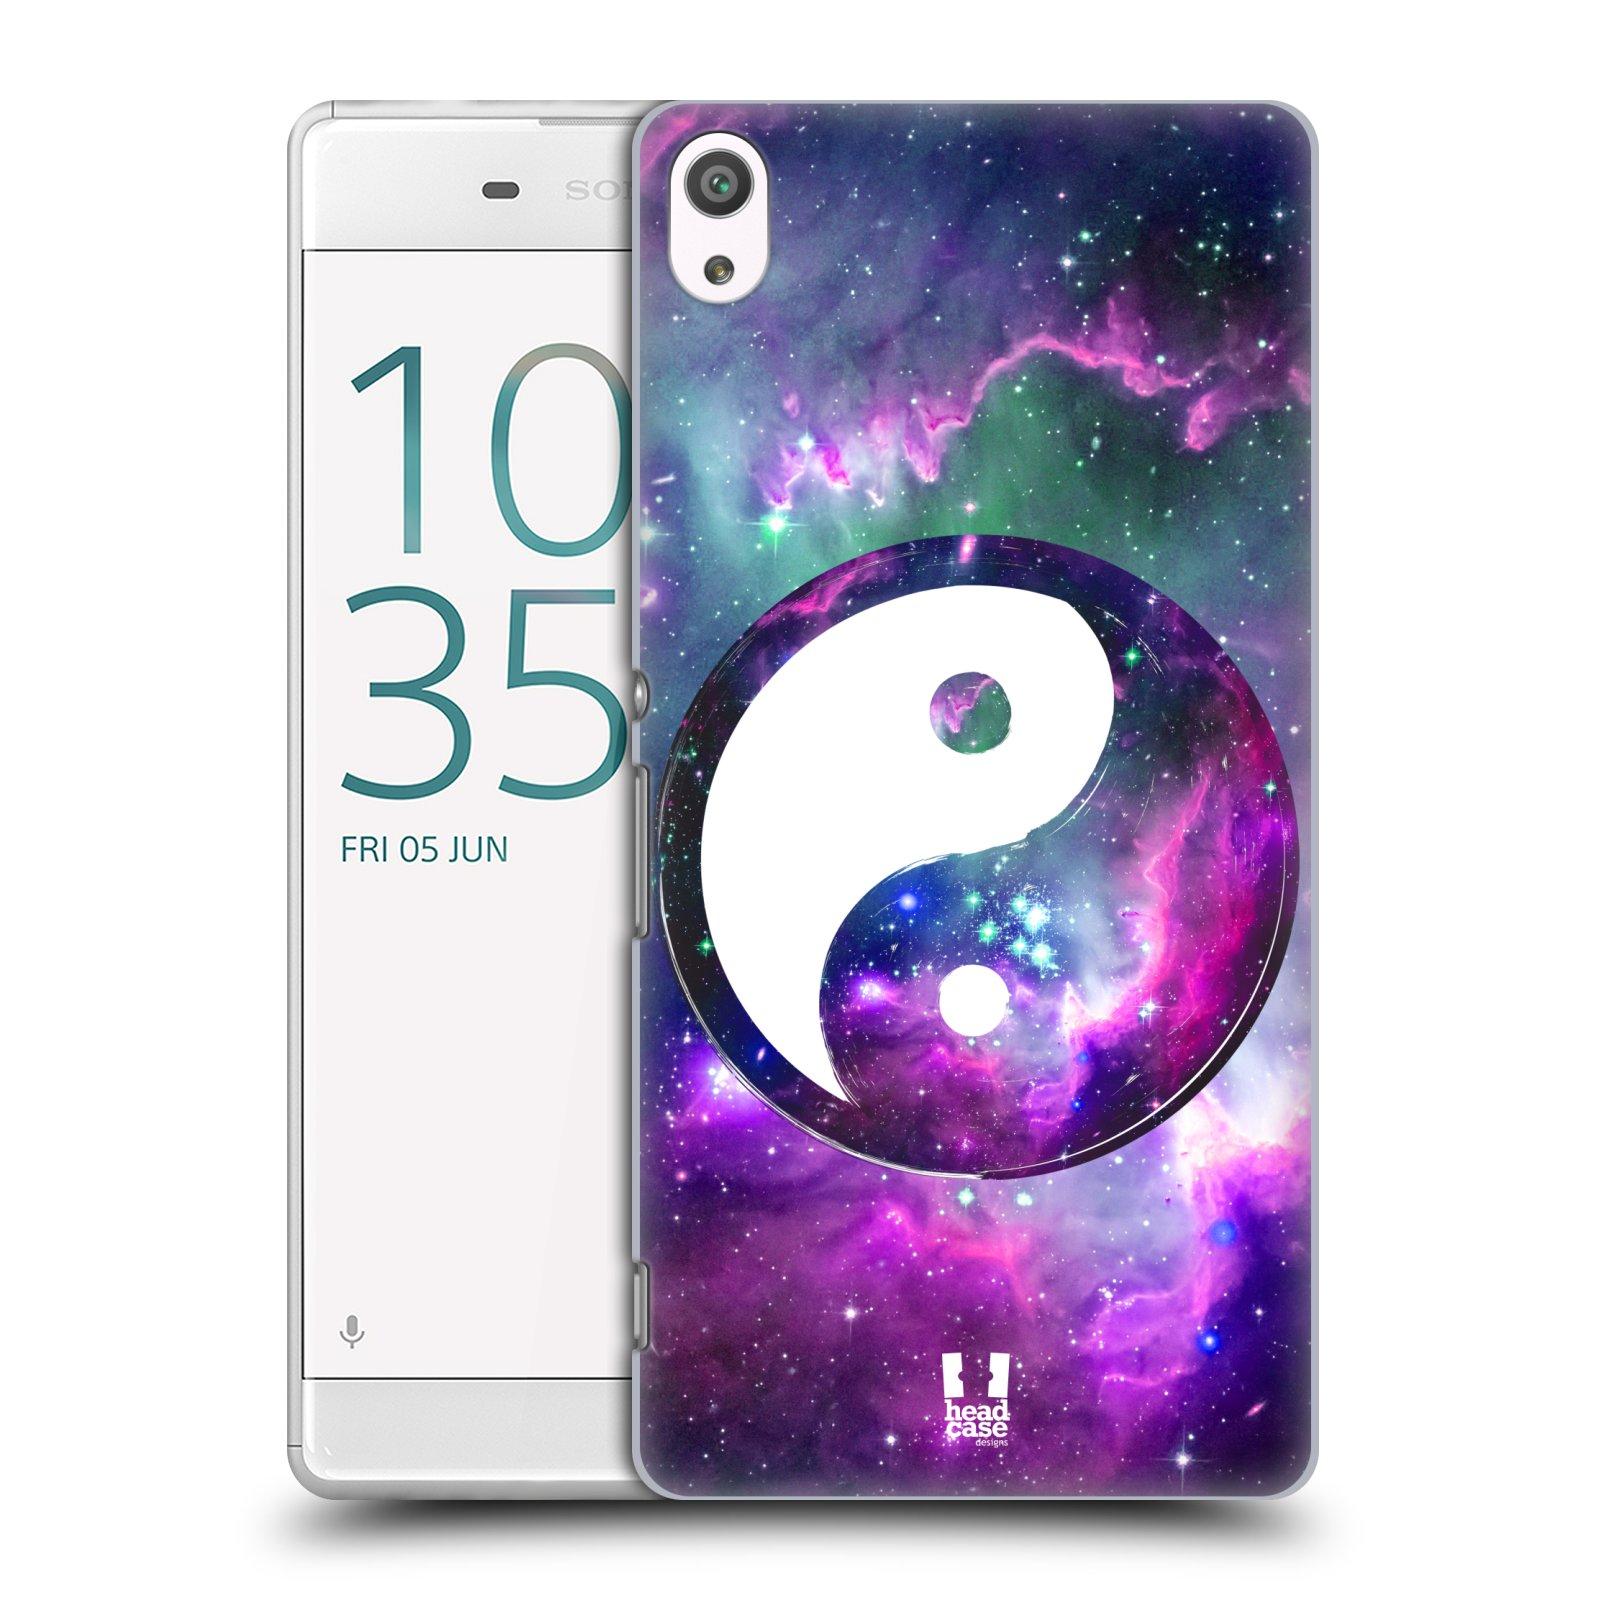 Plastové pouzdro na mobil Sony Xperia XA Ultra HEAD CASE Yin a Yang PURPLE (Plastový kryt či obal na mobilní telefon Sony Xperia XA Ultra F3211)